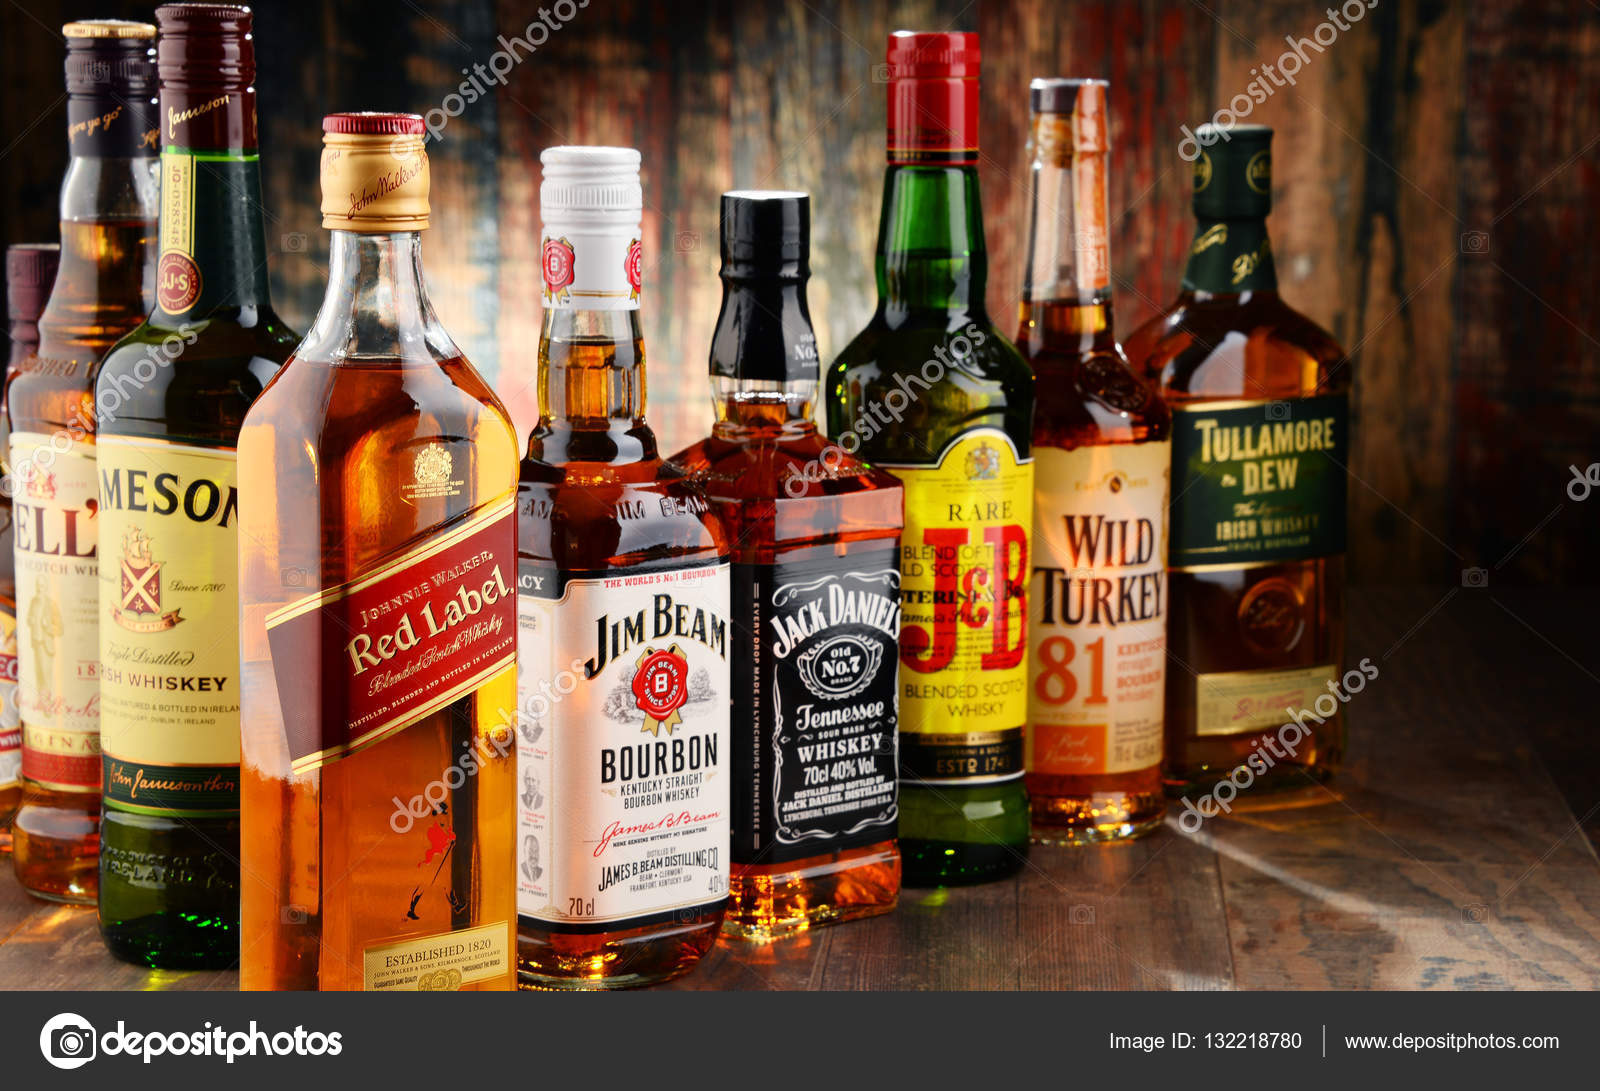 Liquor License-d (44) Retail Distribution-Lakewood, N.j For Sale